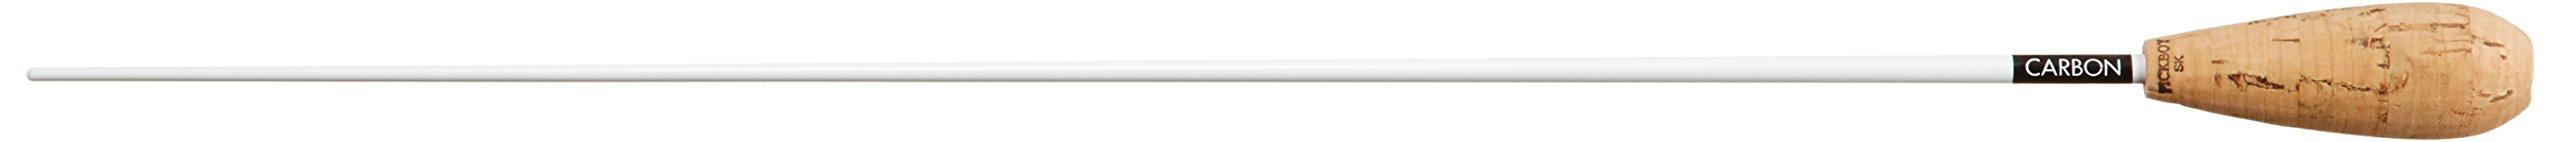 PICKBOY carbon graphite Music Baton tact NCS-K (japan import)